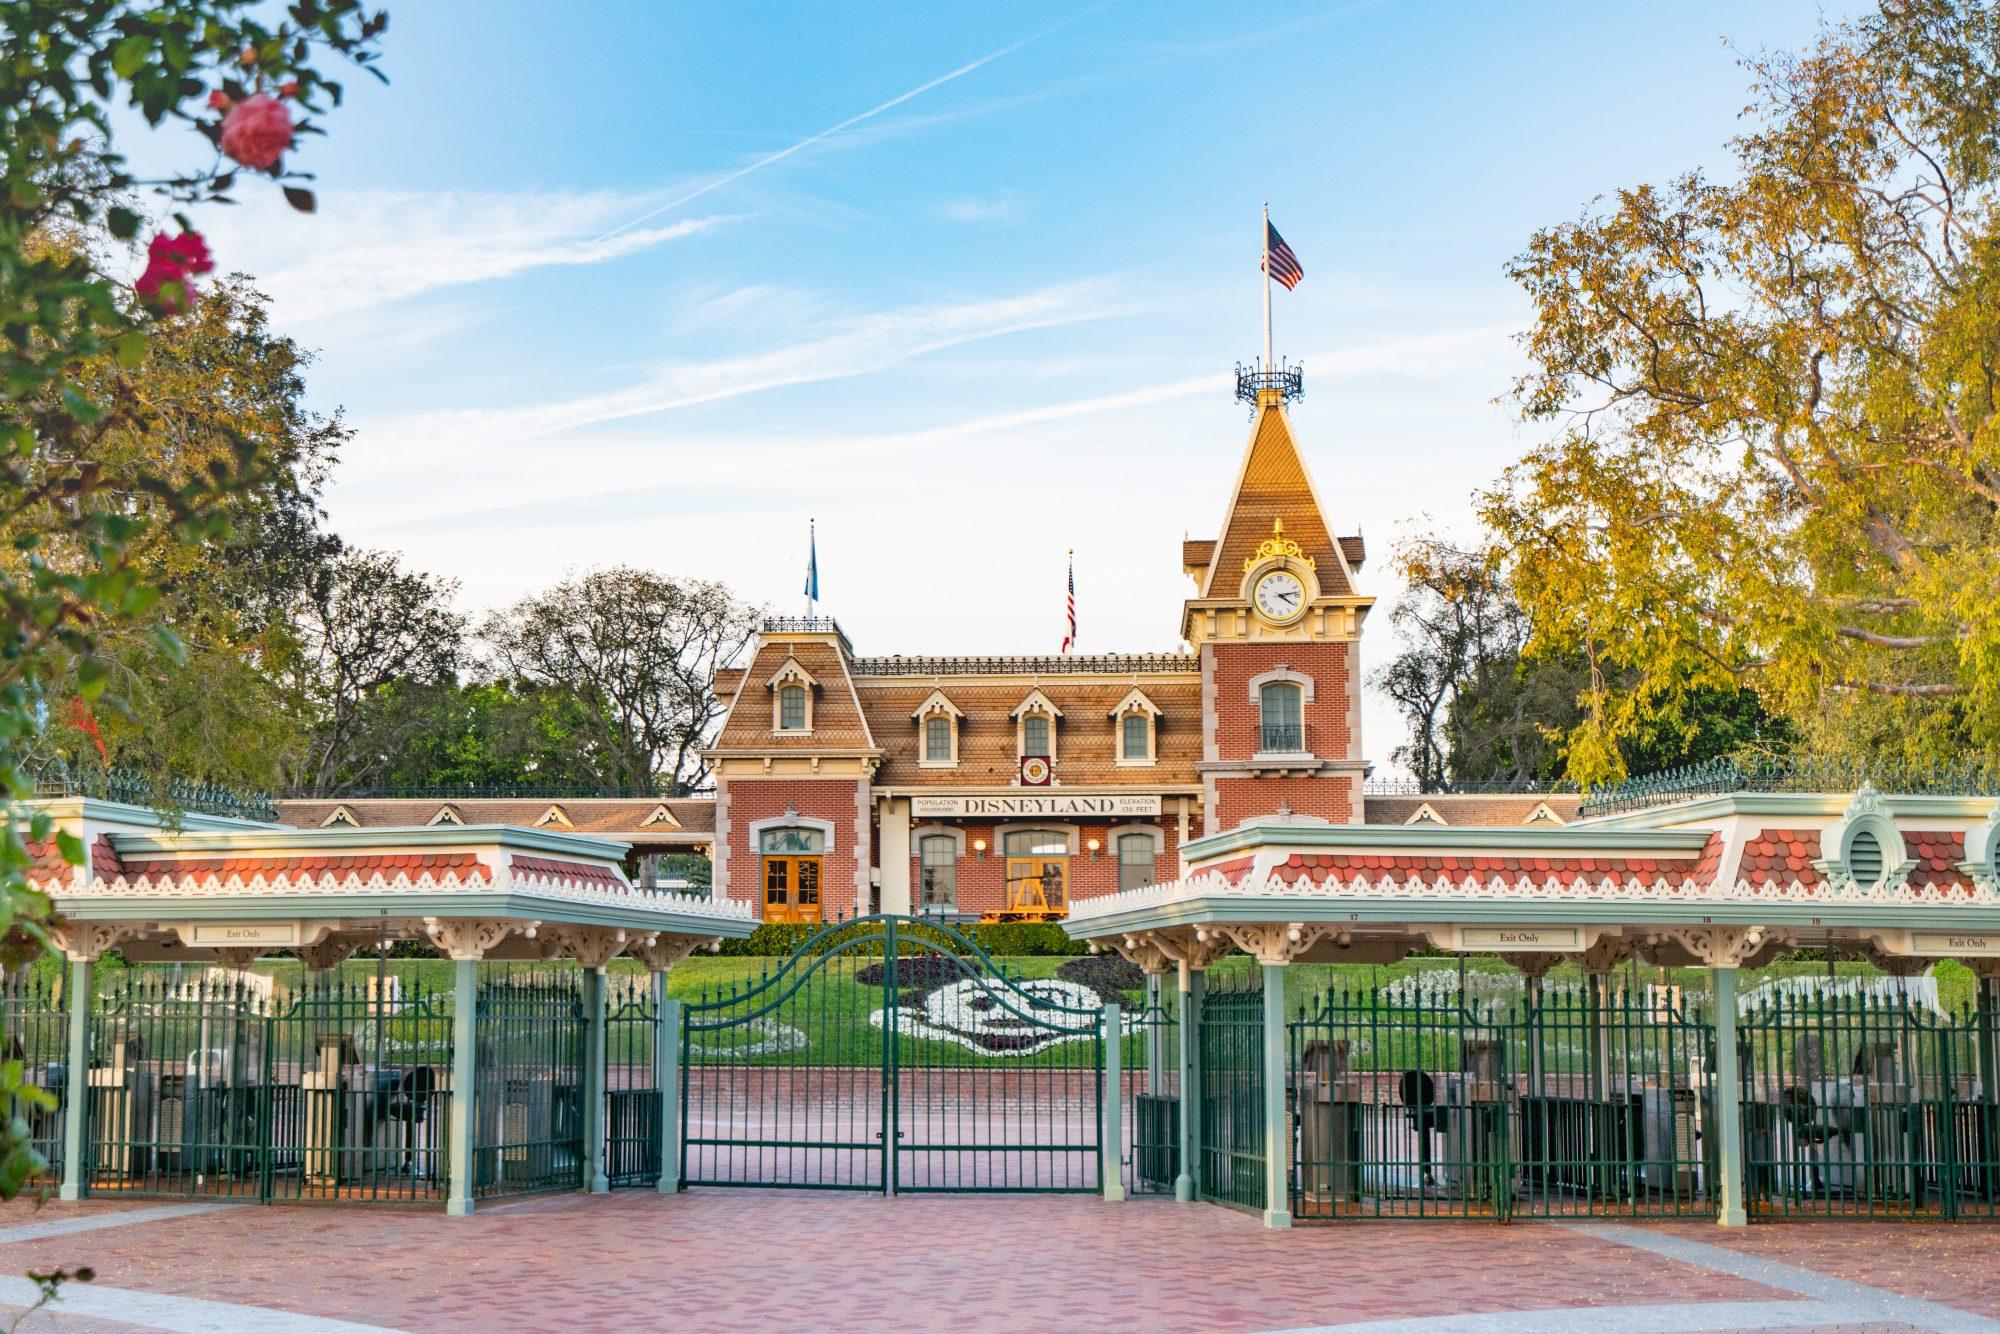 Disneyland theme park, Anaheim, California